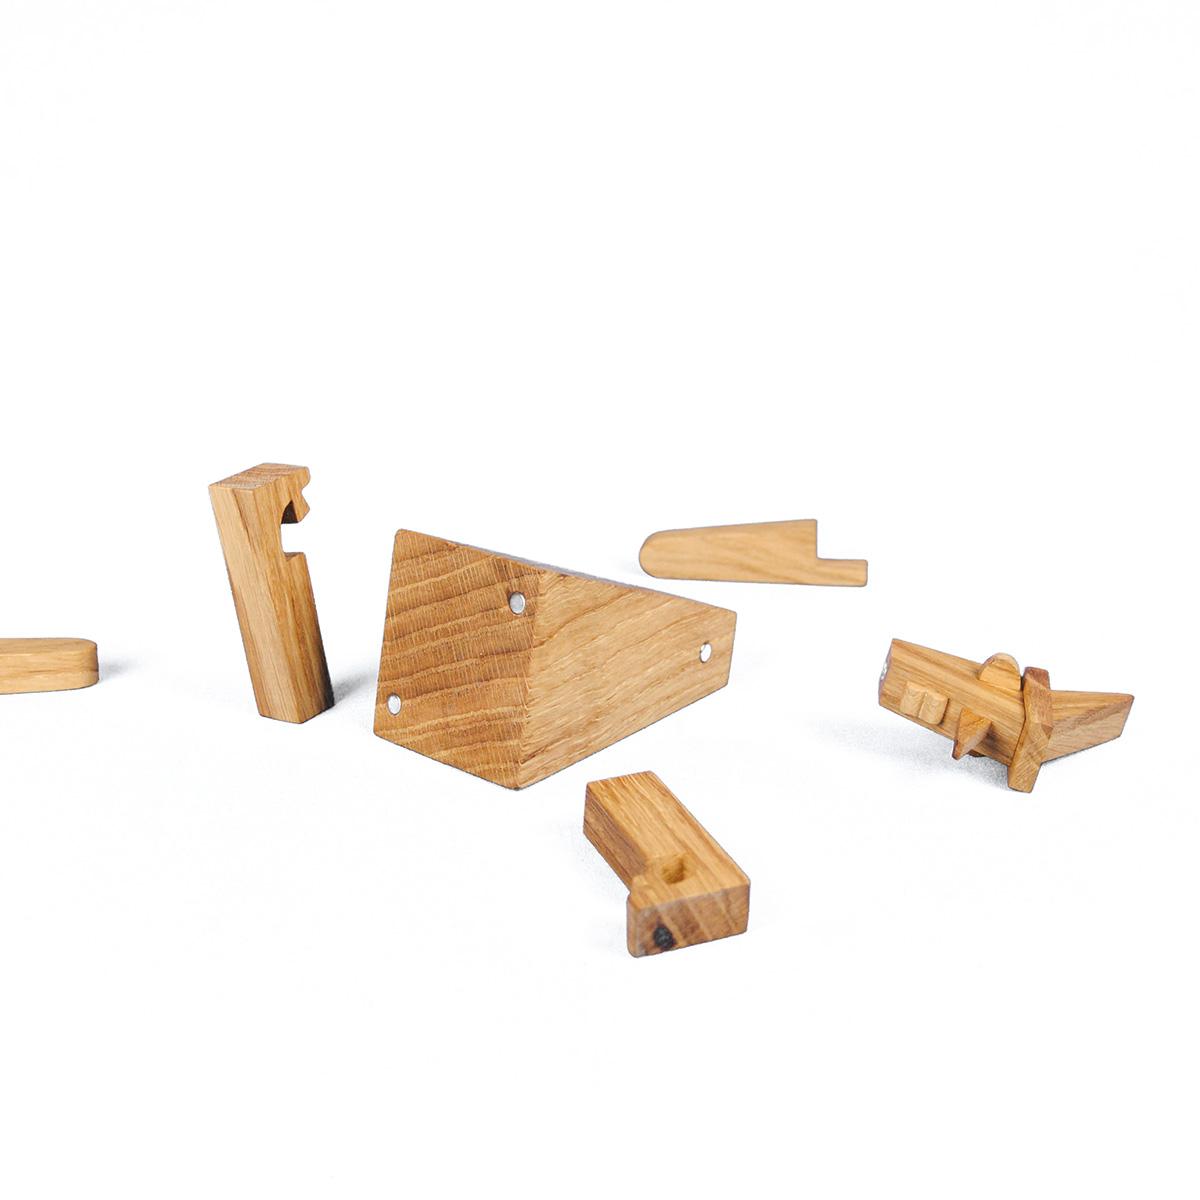 pagliaccetto-depero-wooden-toy-futurism